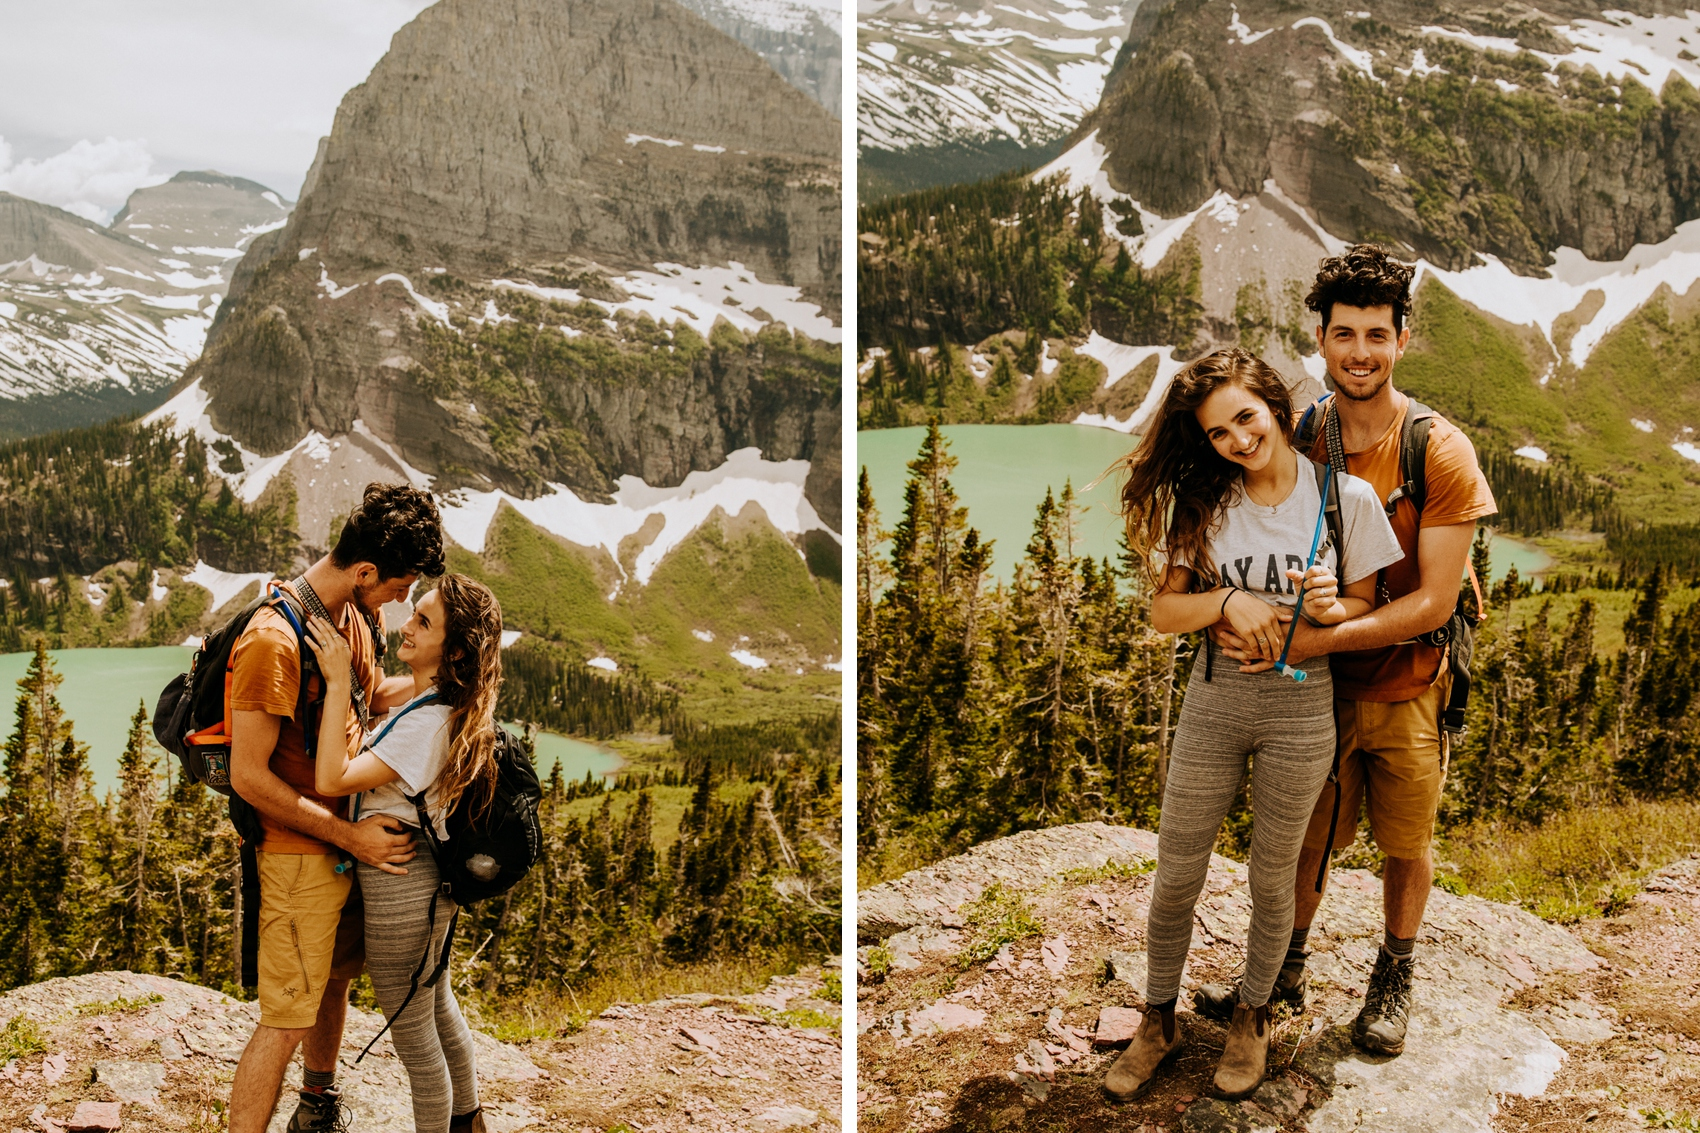 mountainous-hiking-adventure-couple-photos.jpg